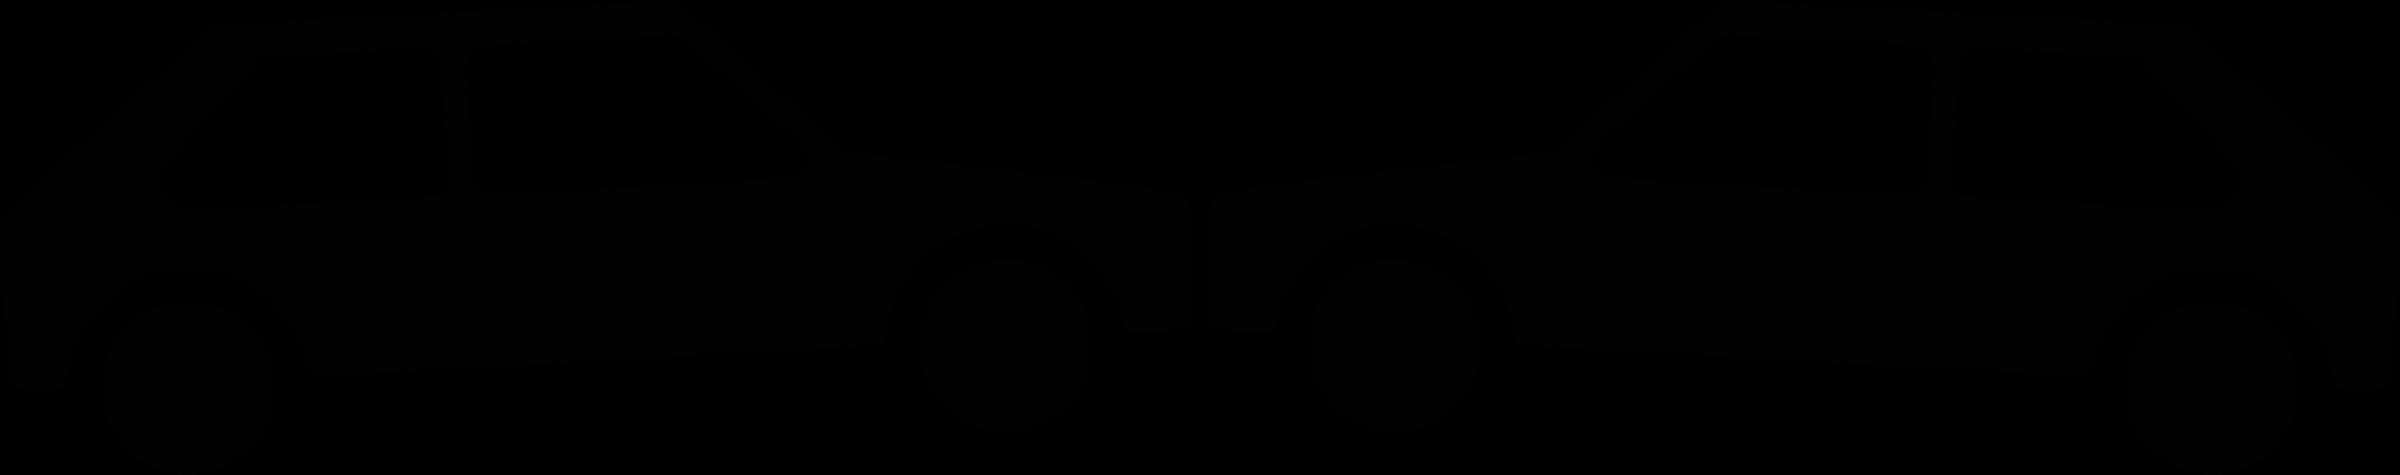 Clipart cars logo. Car accident big image